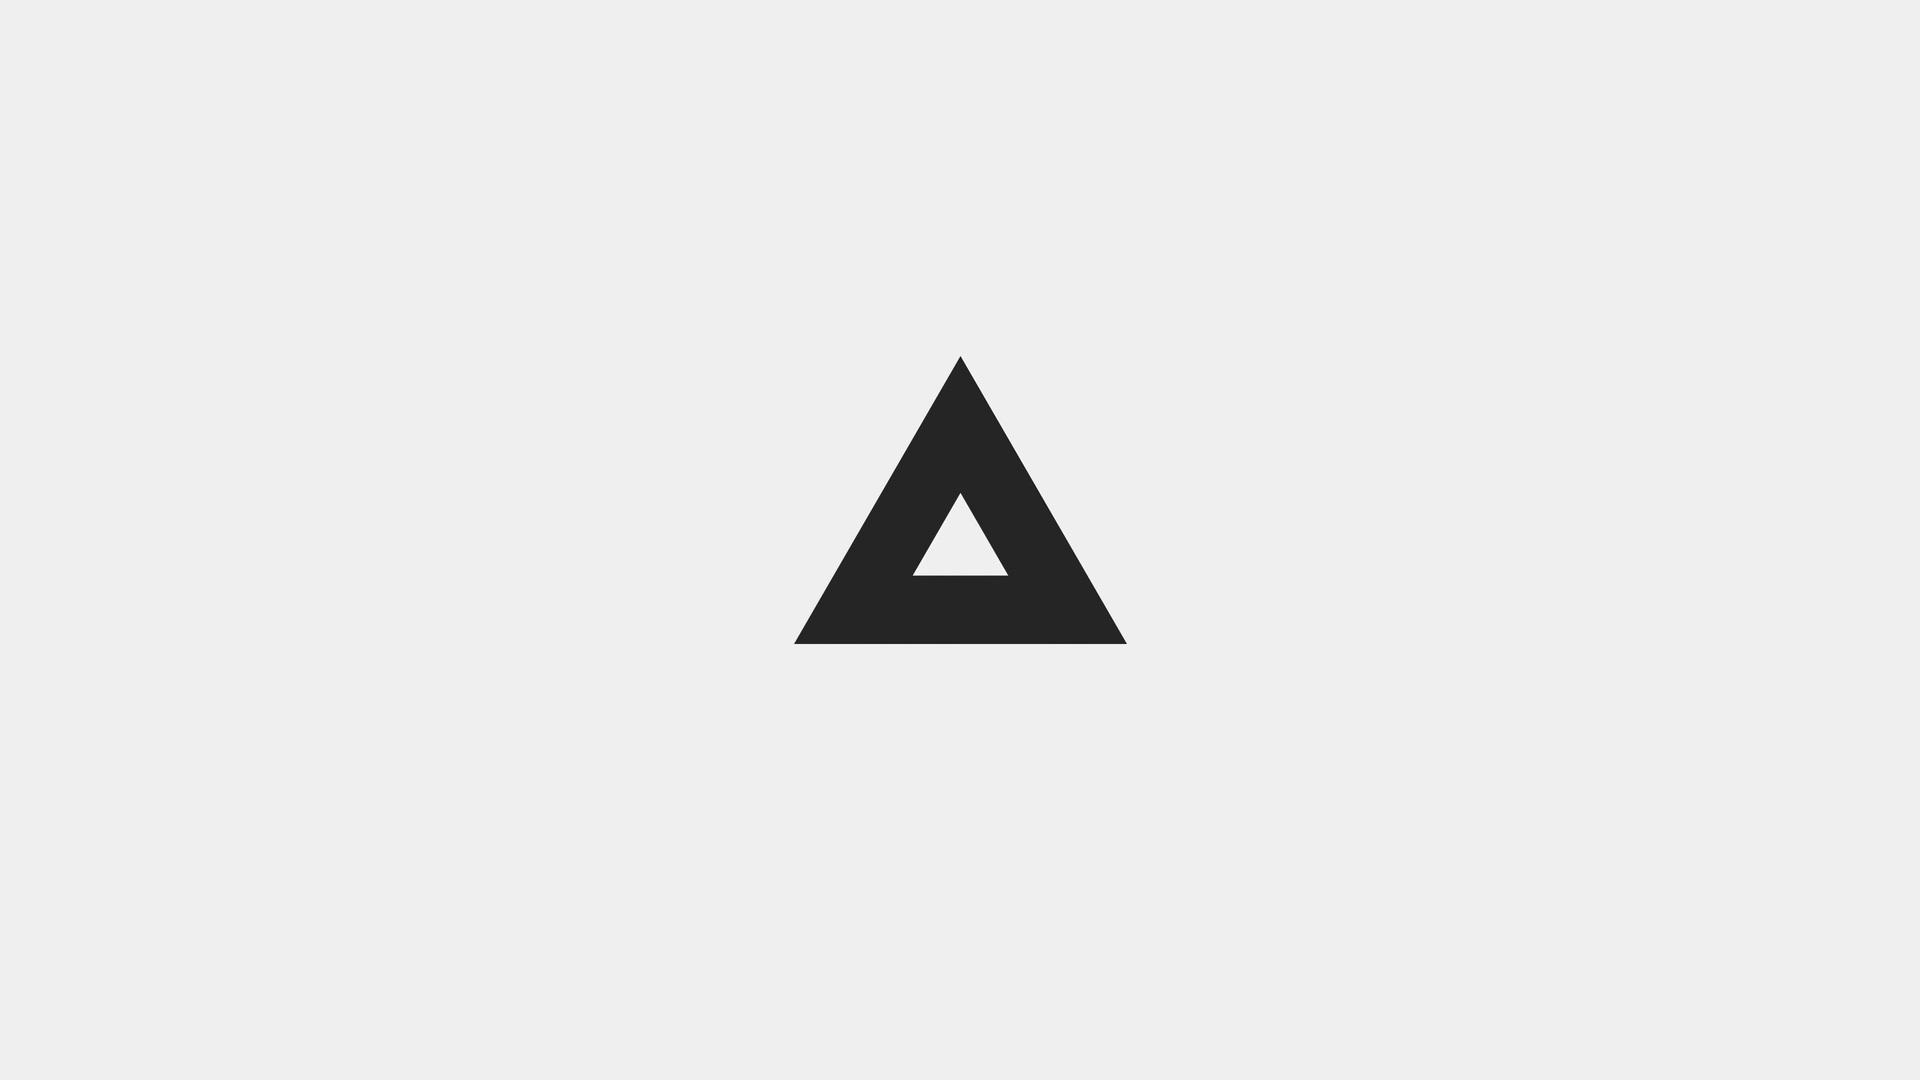 1920x1080 Minimal Triangle White Background 4k Laptop Full Hd